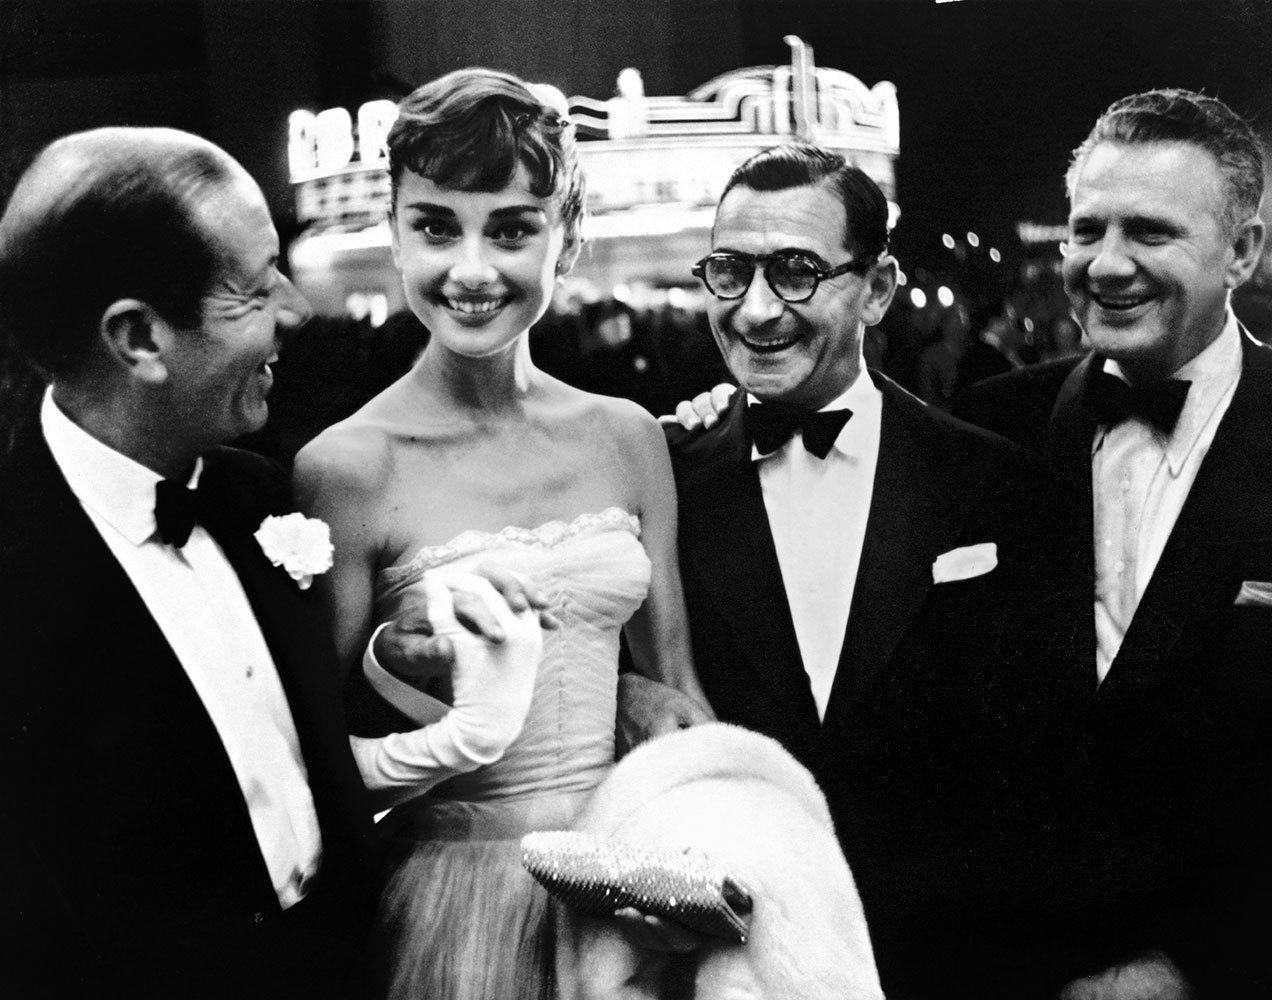 Audrey Hepburn candid | Rare Candid Photos of American Icons: Elvis, John Wayne, Elizabeth ...